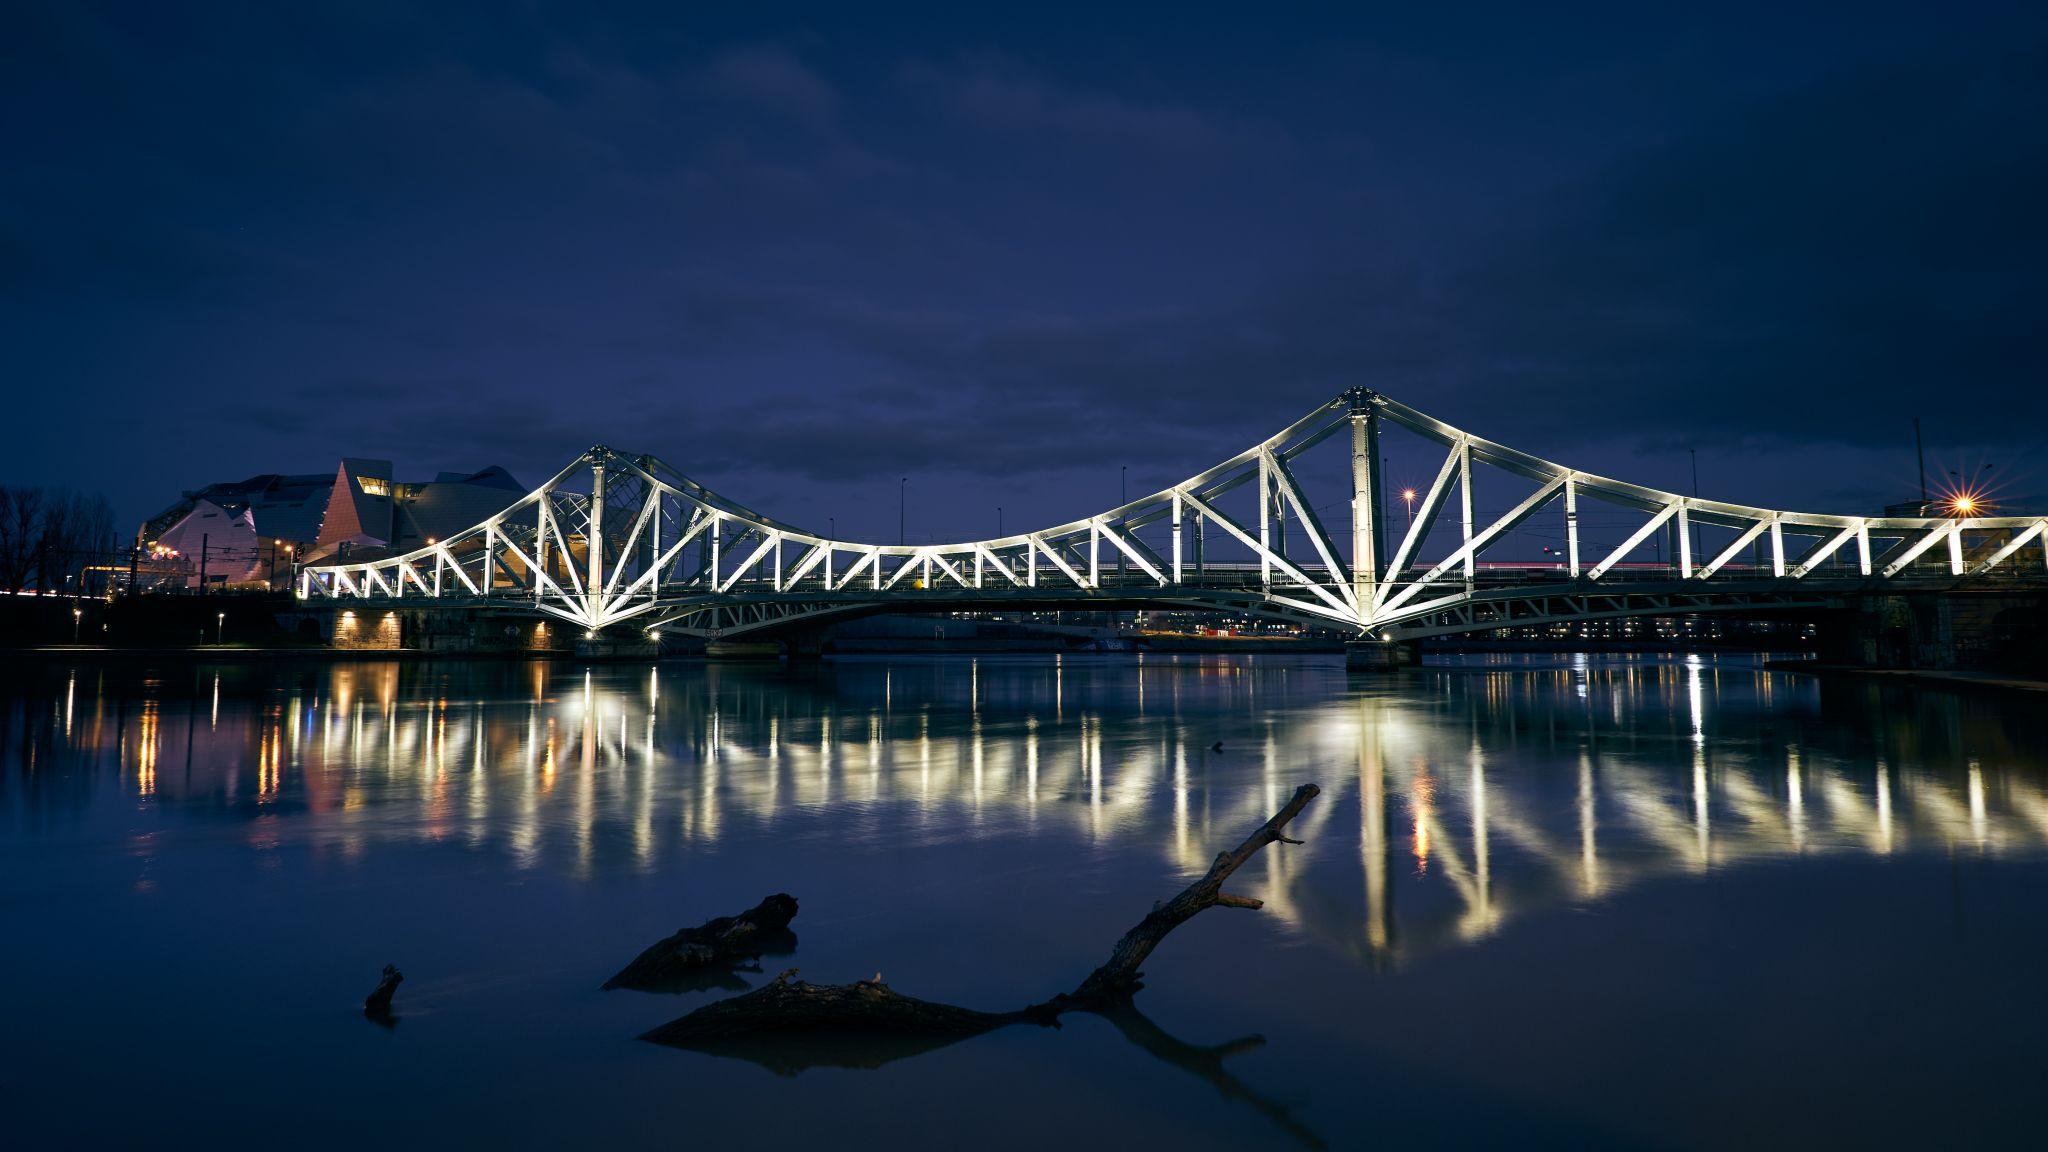 Illuminated railway bridge, France